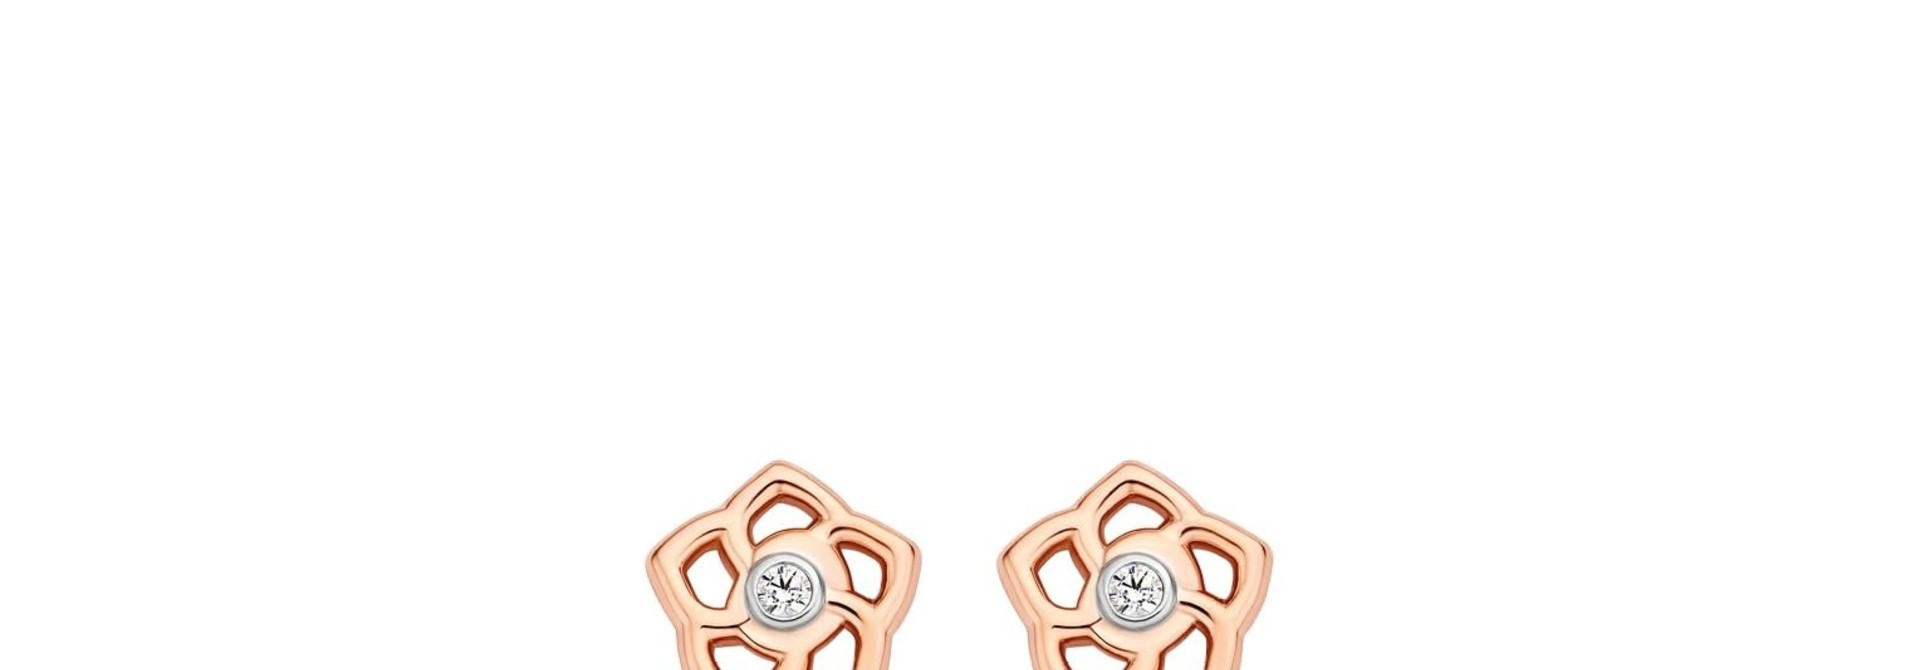 TI SENTO - Milano Earrings 7809ZR